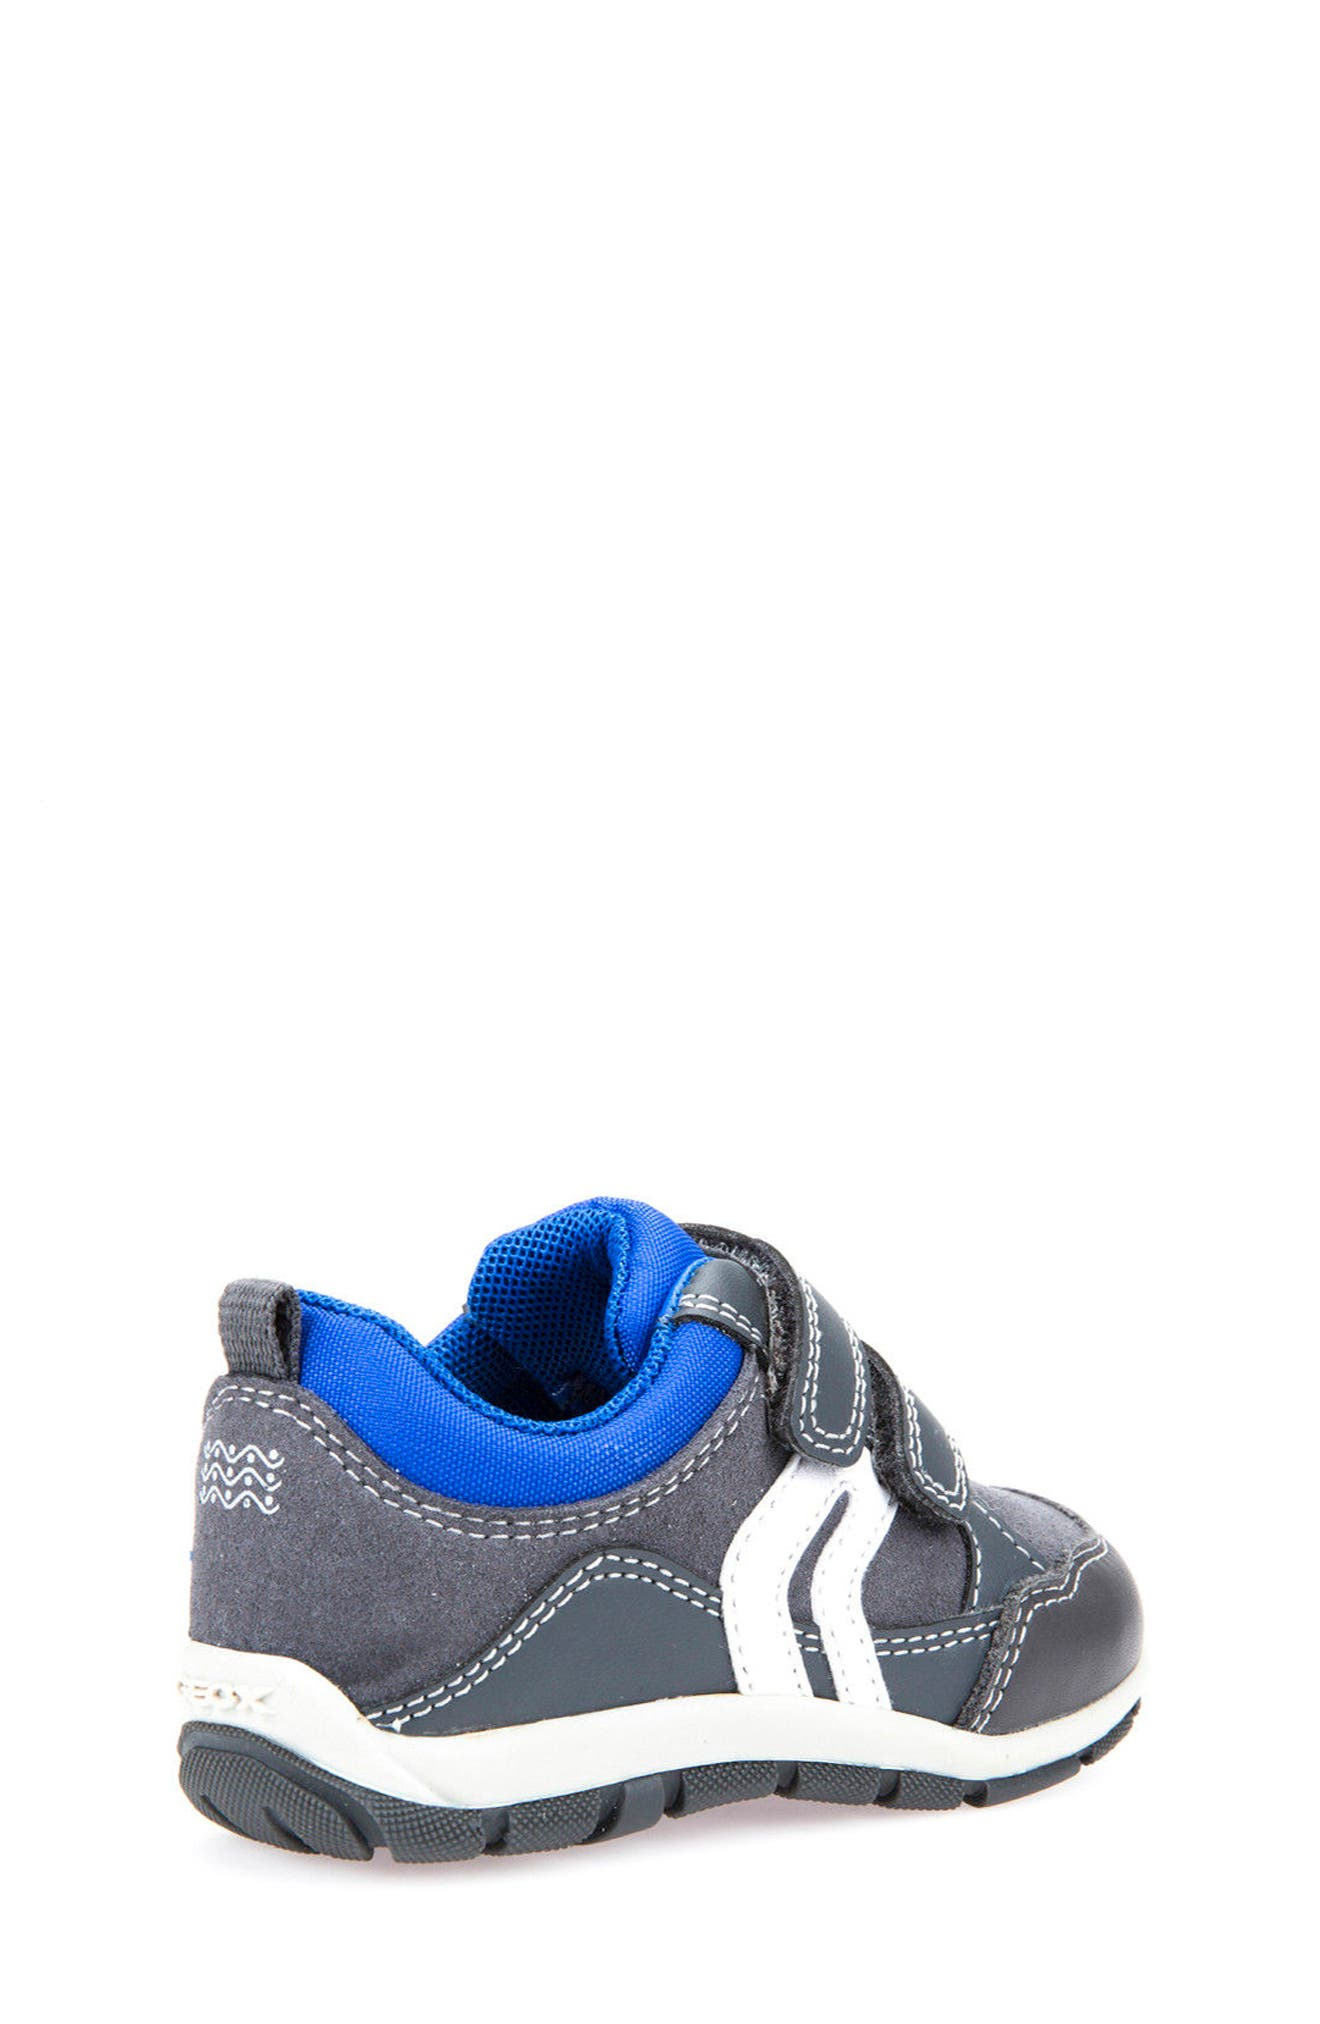 'Shaax 9' Sneaker,                             Alternate thumbnail 2, color,                             Grey/ Royal